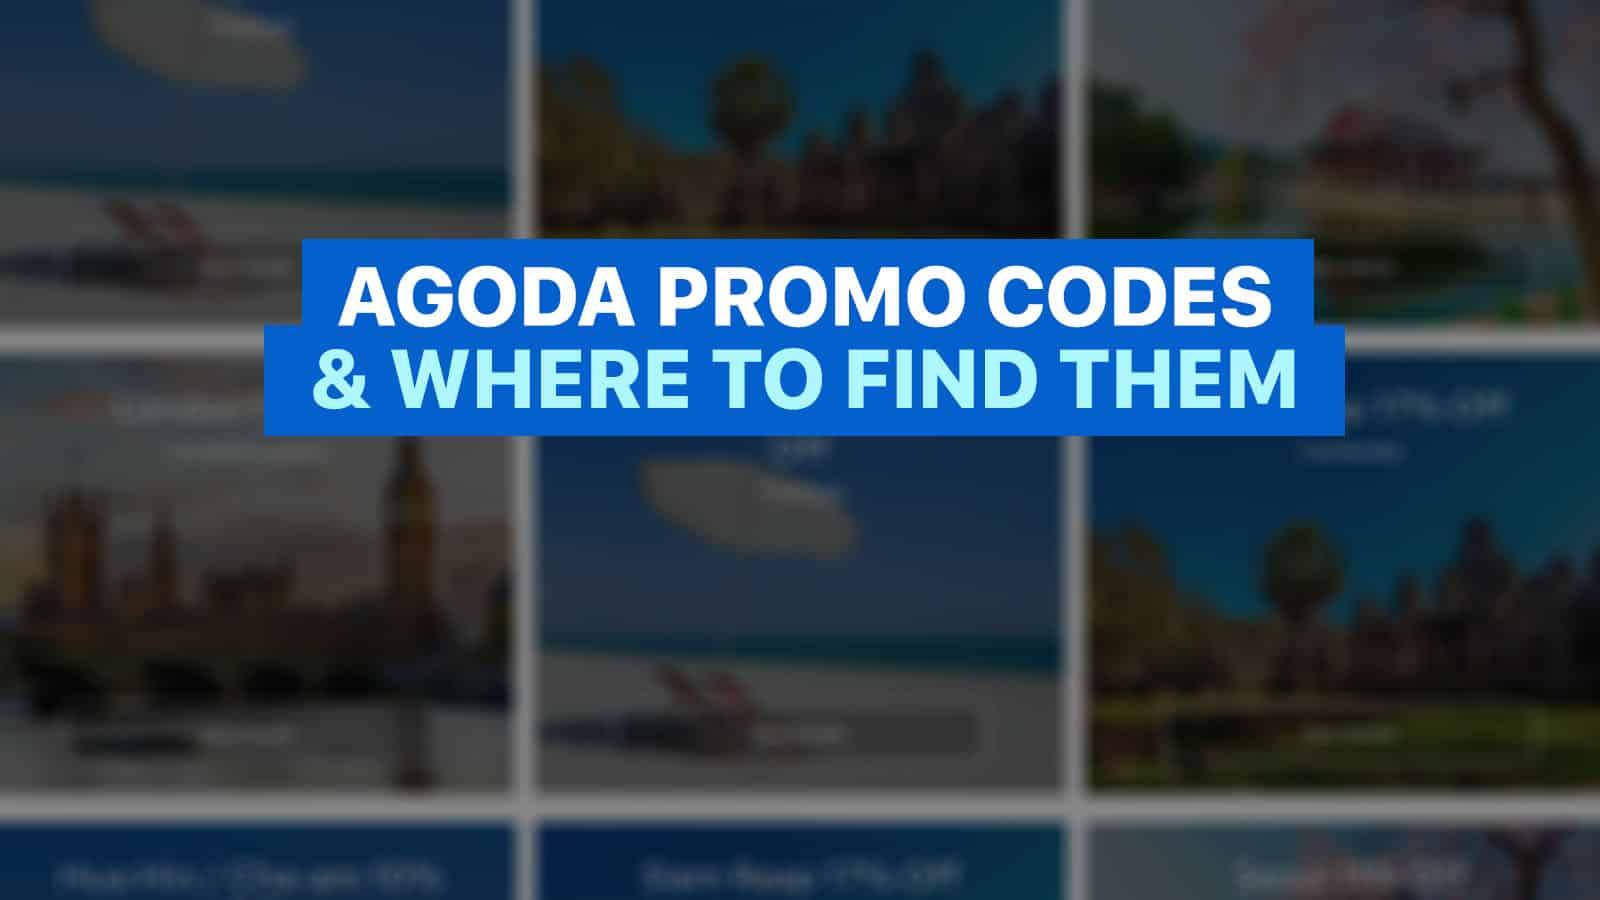 agoda promo codes and